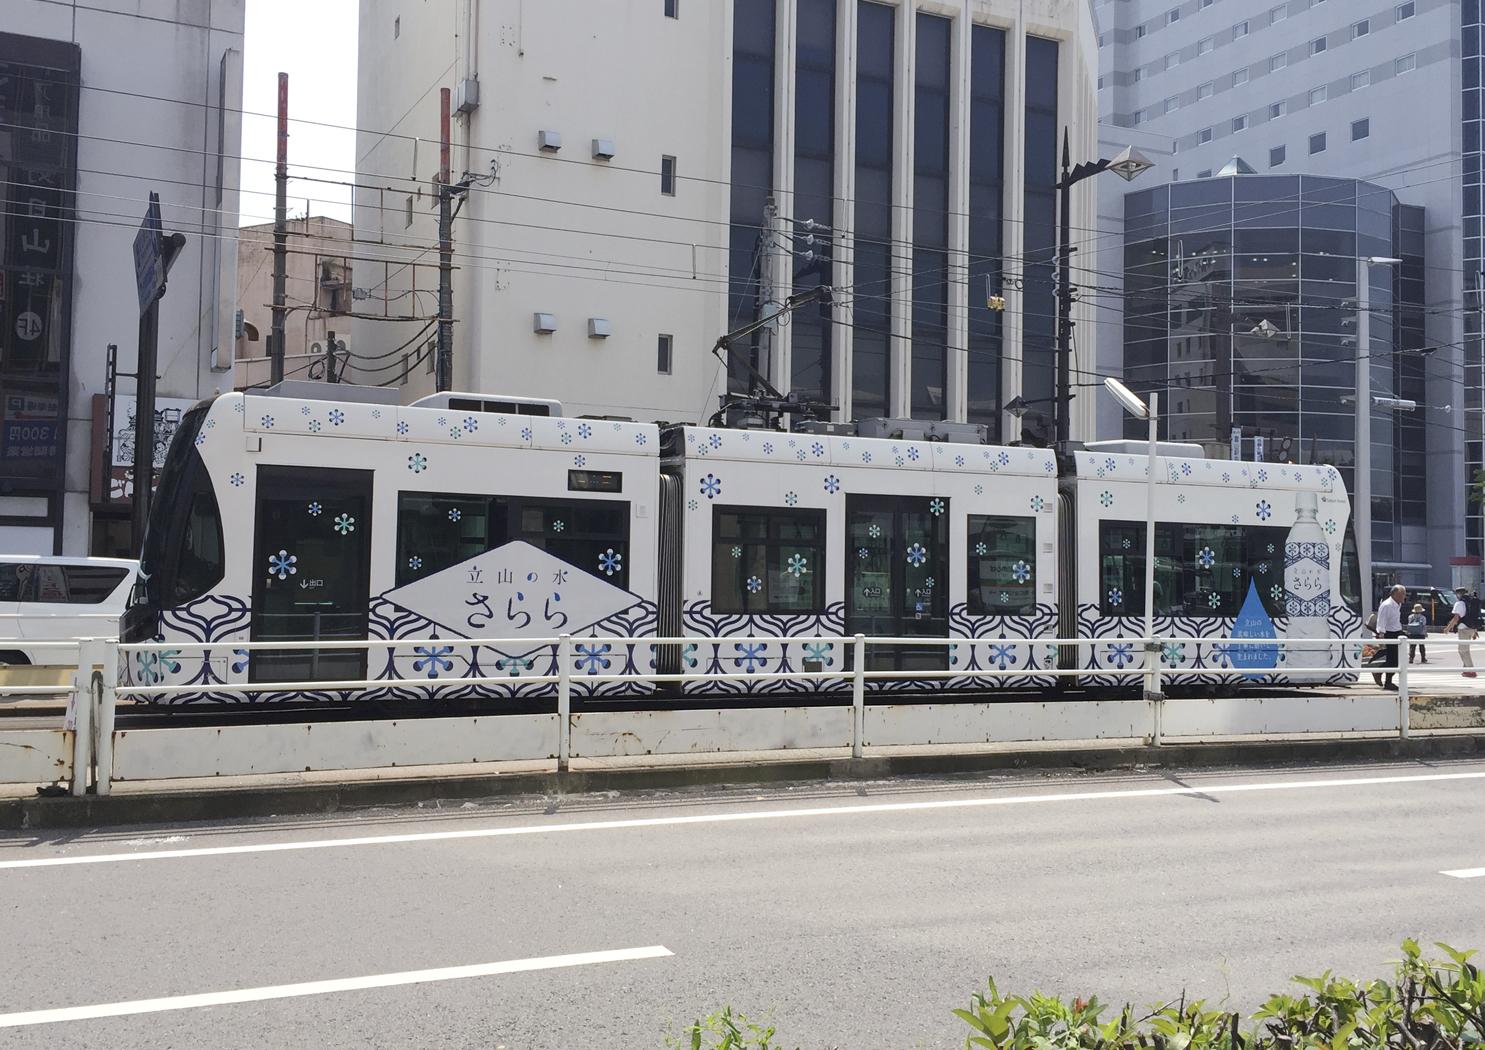 sarara wrapping train